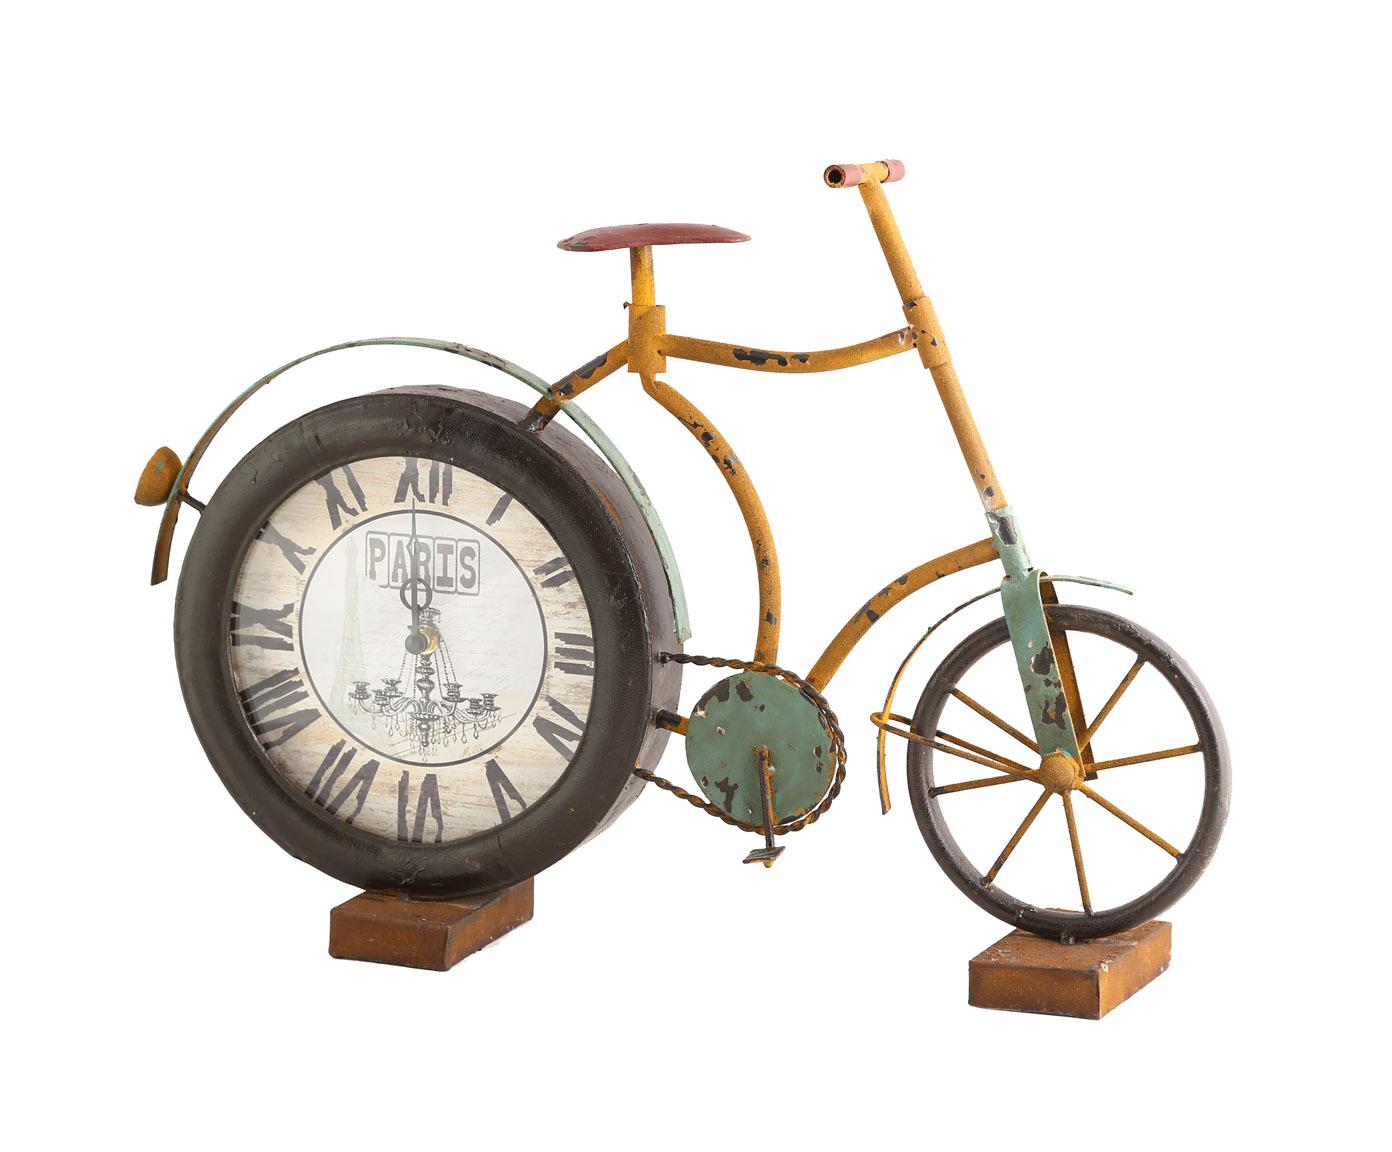 Часы настольныеНастольные часы<br>Кварцевый механизм, работают от батарейки типа АА<br><br>Material: Металл<br>Width см: 54<br>Depth см: 11<br>Height см: 37